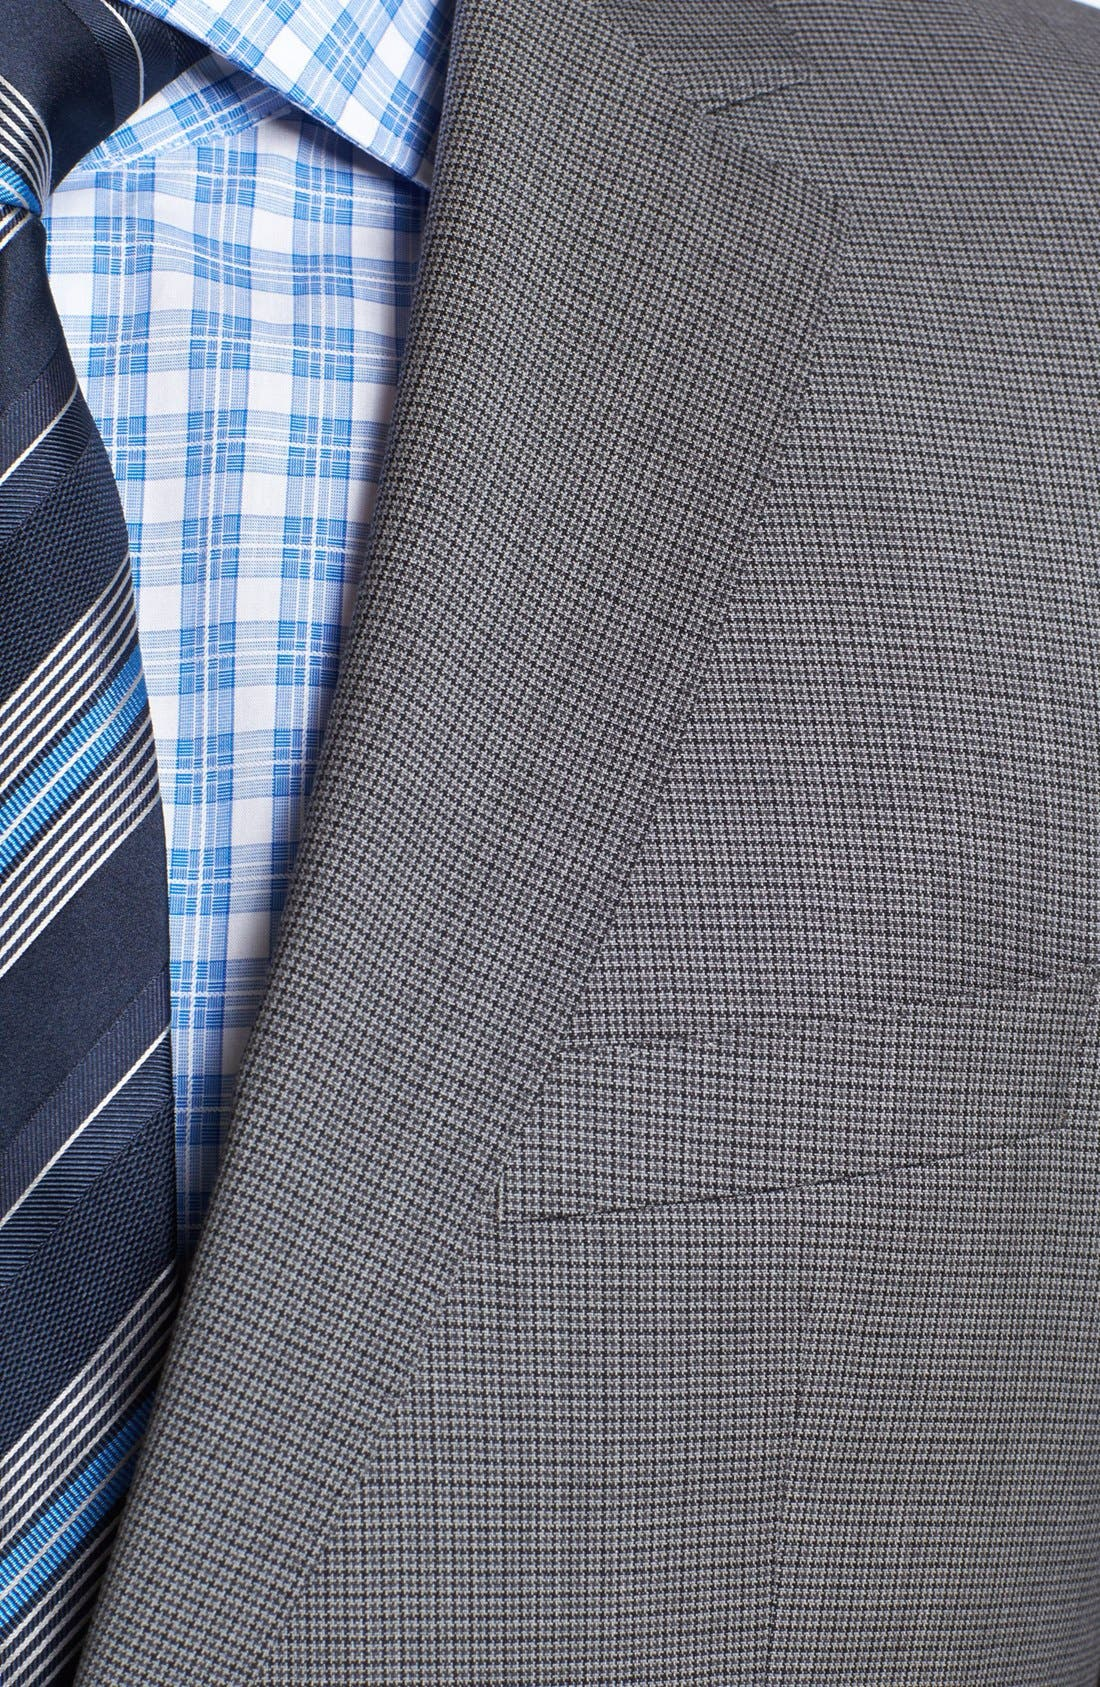 Alternate Image 2  - BOSS HUGO BOSS 'James/Sharp' Trim Fit Houndstooth Suit